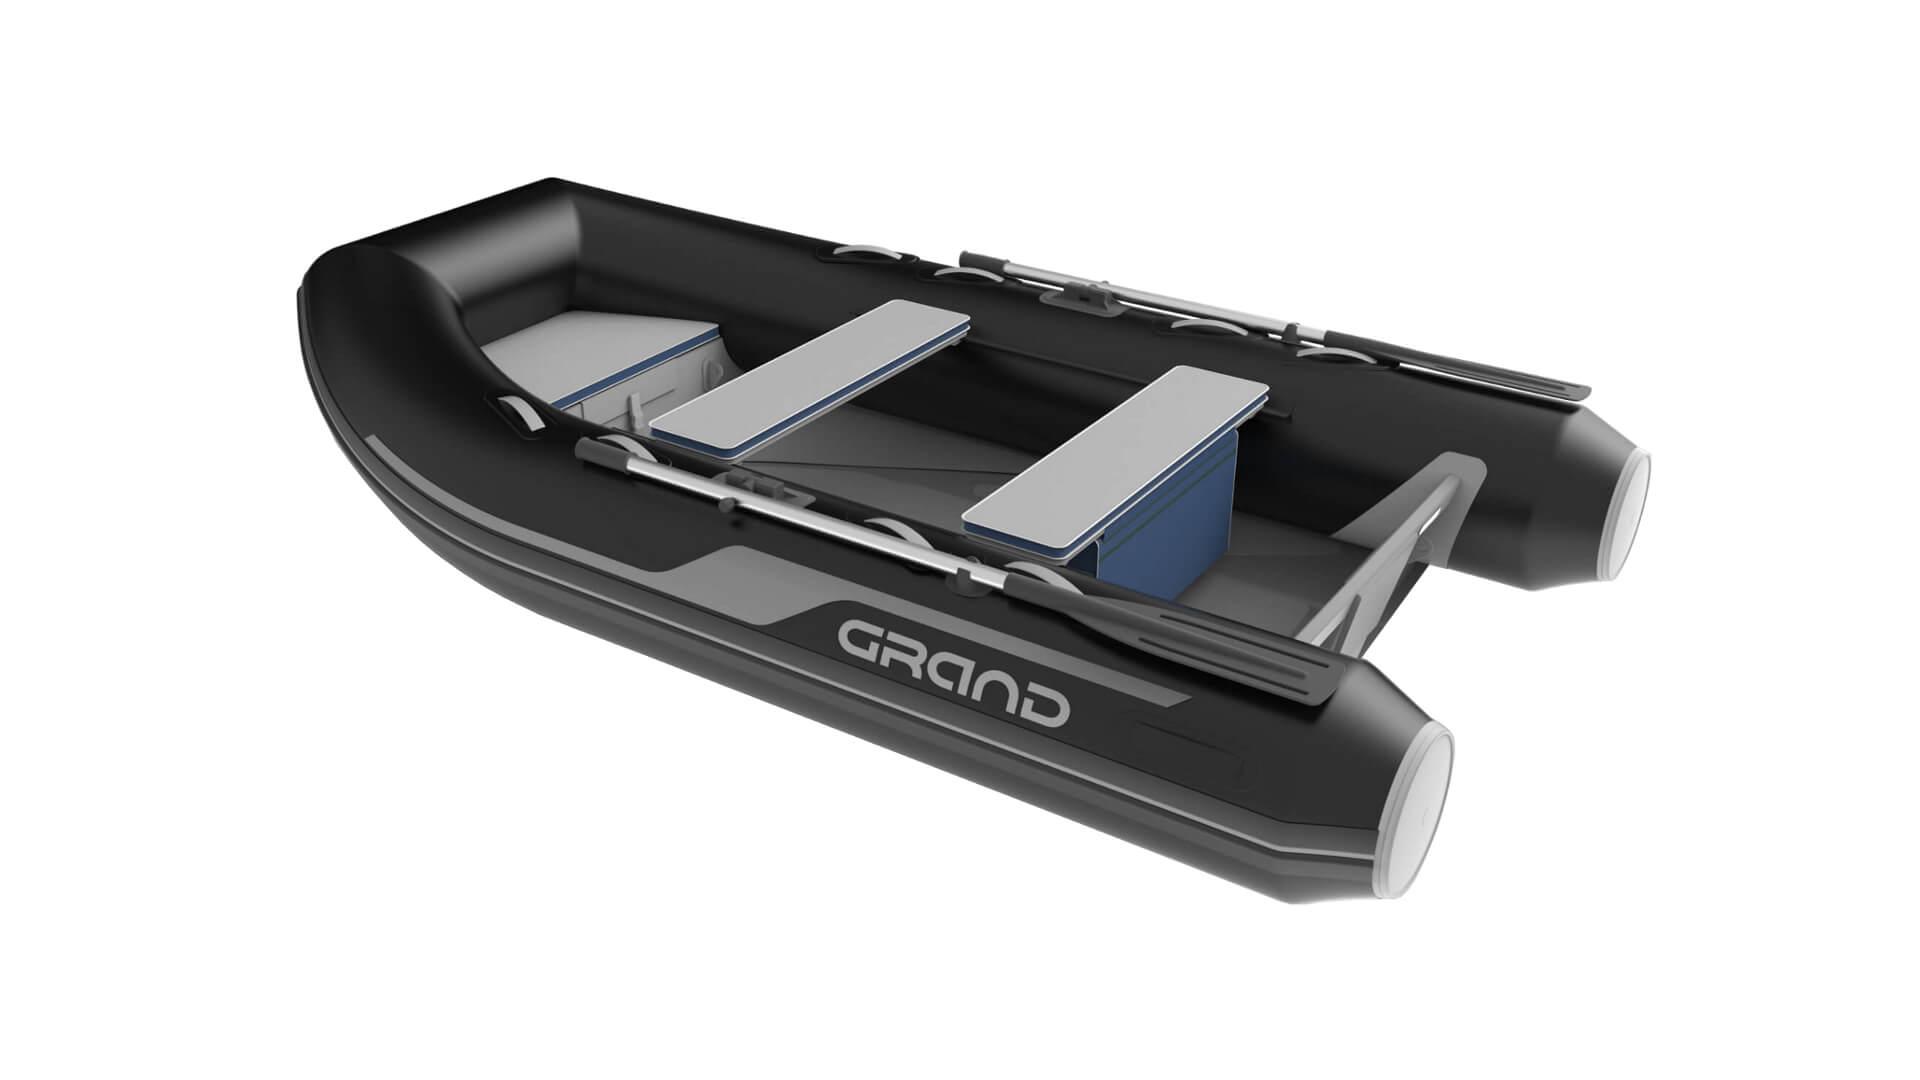 Надувная лодка с жестким алюминиевым дном GRAND Aluminum Line Alu330D, Надувная лодка GRAND Aluminum Line Alu330D, GRAND Aluminum Line Alu330D, GRAND Alu330D, Надувная лодка GRAND, Надувная лодка ГРАНД, Надувная лодка с жестким дном, RIB, Rigid Inflatable Boats